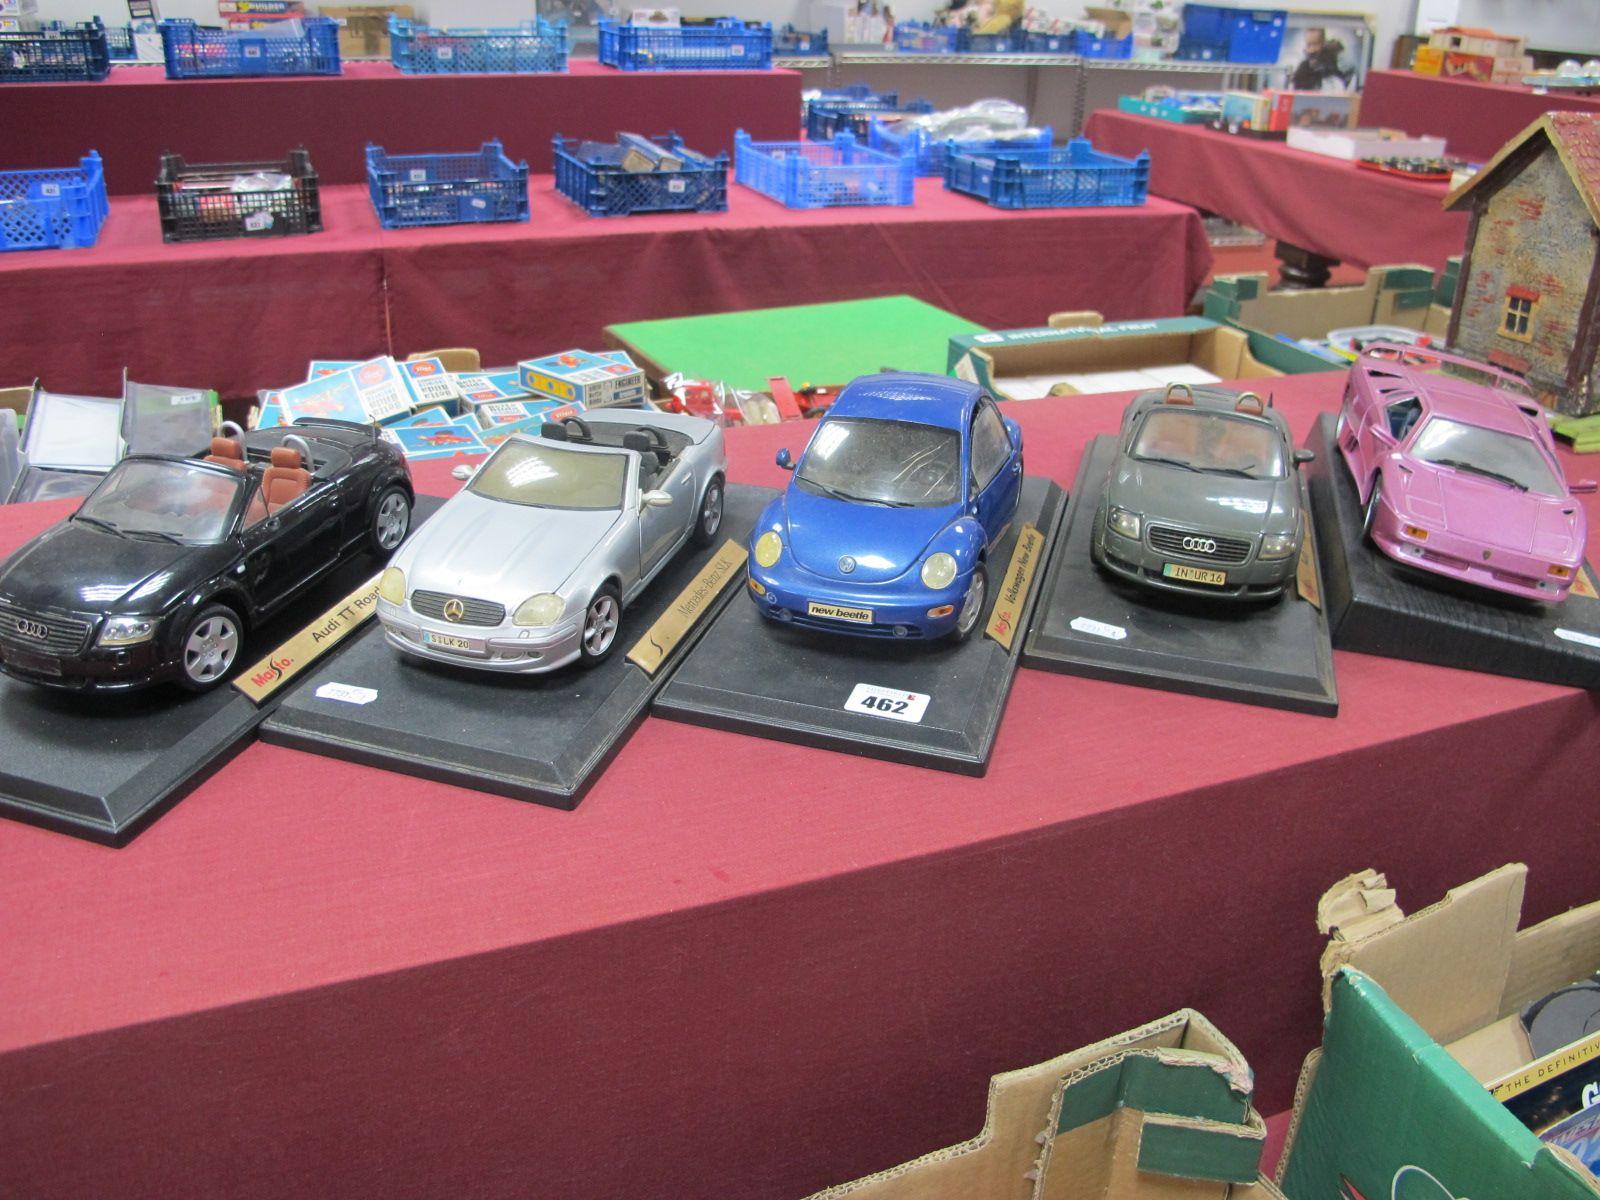 Maisto - Five Late 1990/Early 2000's Model Vehicles, on plinths, to include Lamborghini Diablo, Audi